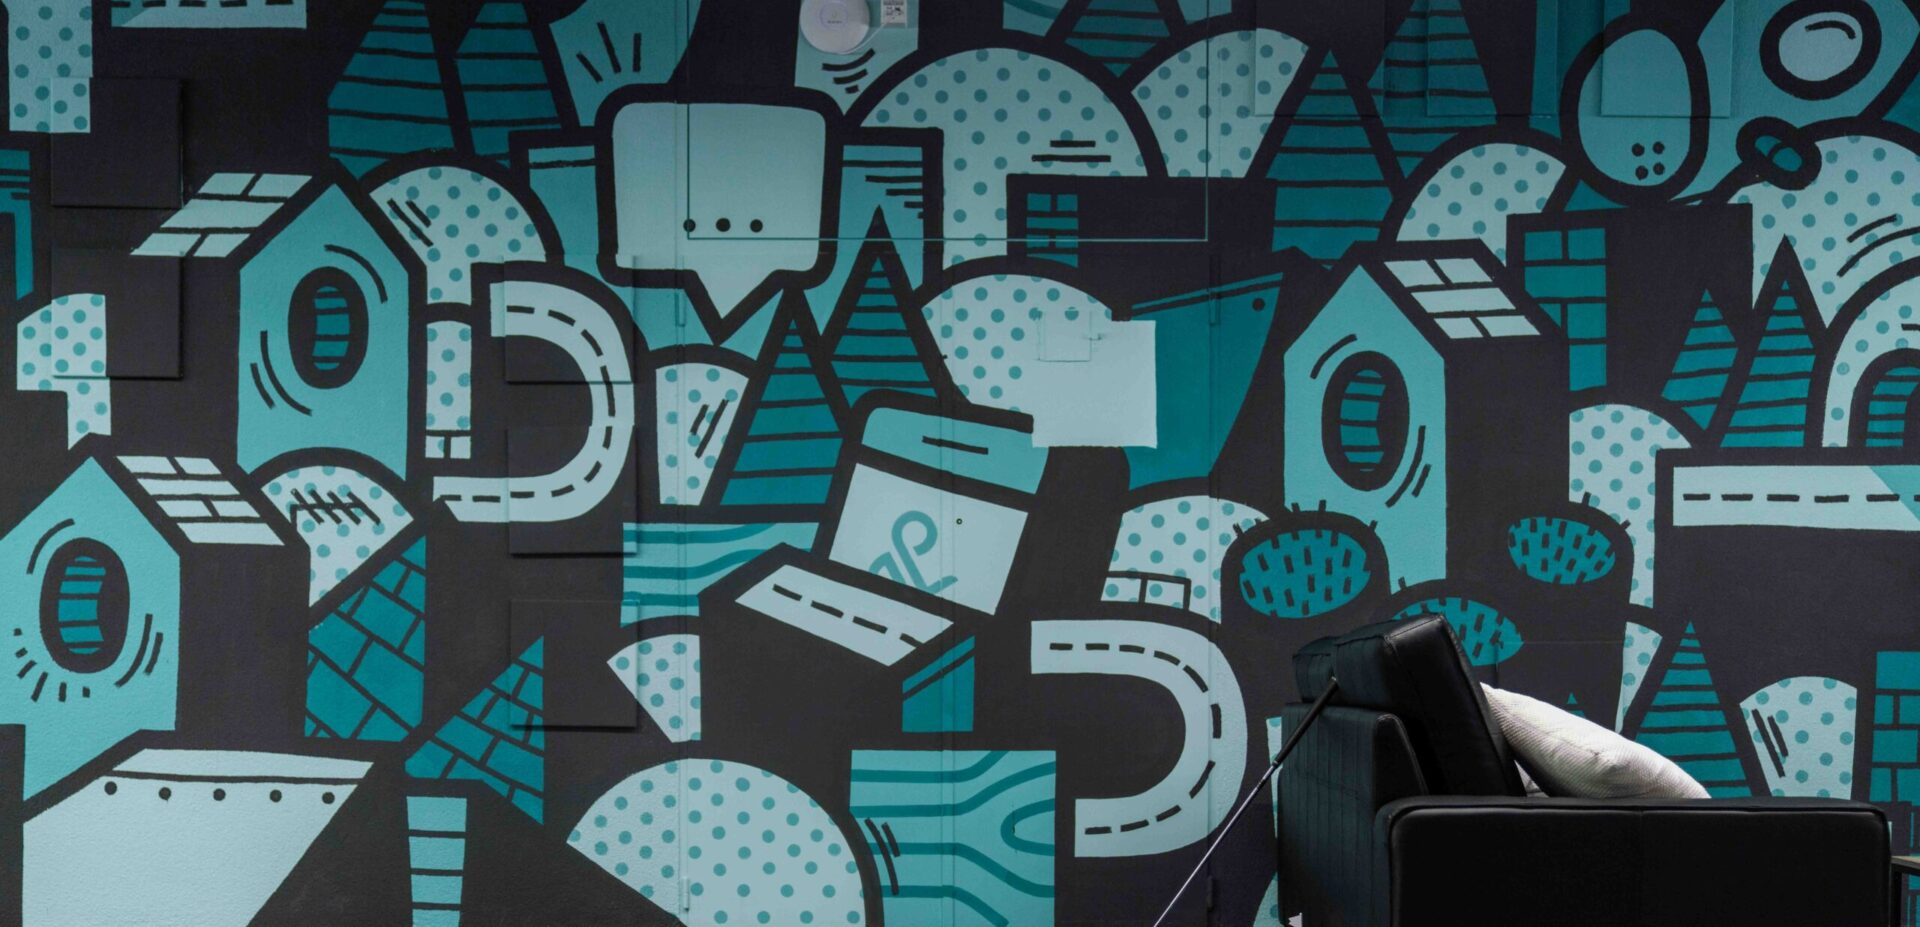 Kunstwerk von Dominik Rüegg im ads&figures Büro